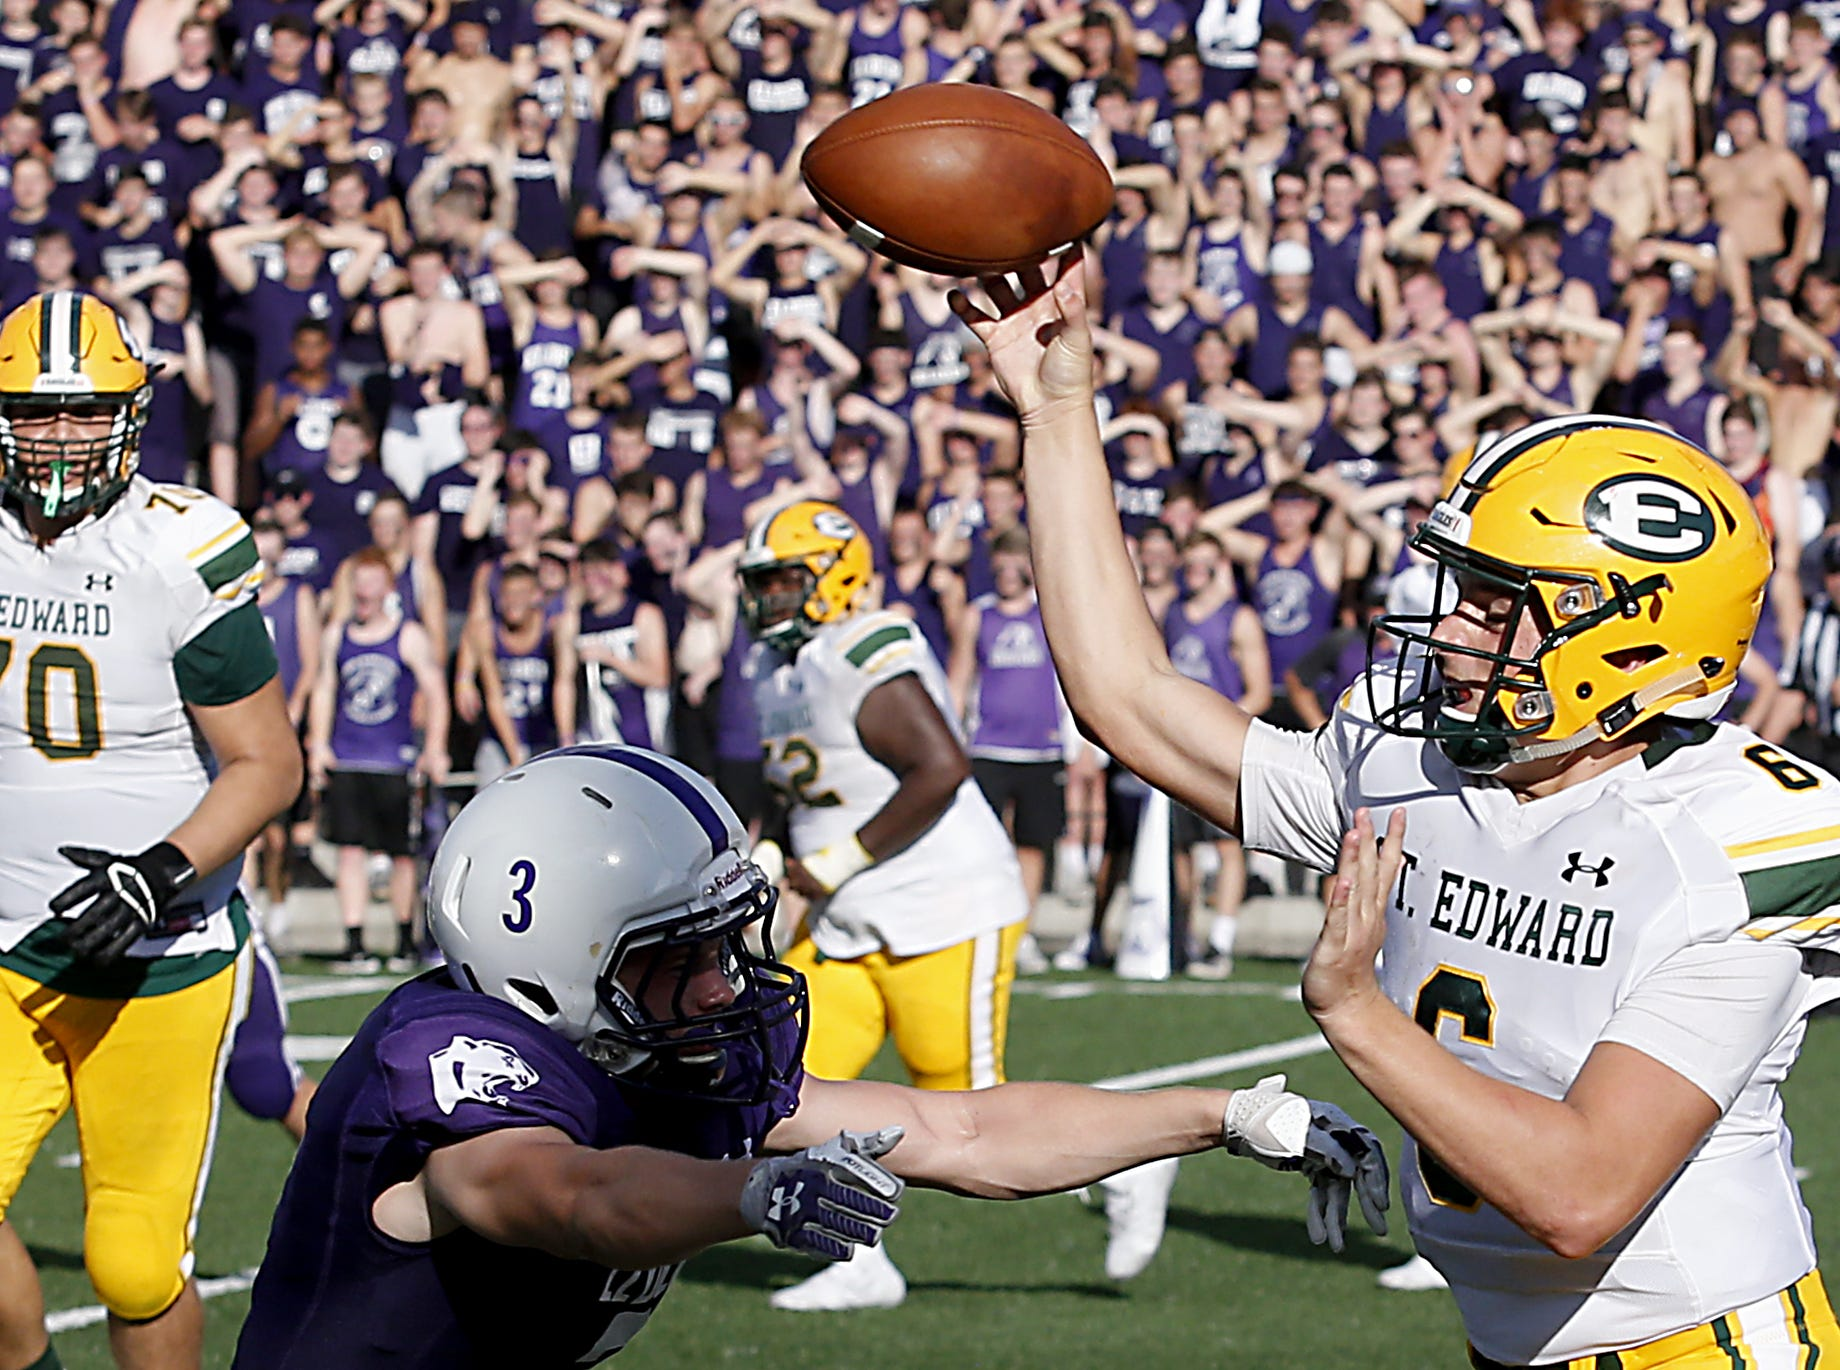 Elder defensive back Eric Beck pressures St. Edward quarterback Garrett Dzuro during their game at The Pit in Cincinnati Saturday, Sept. 15, 2018.